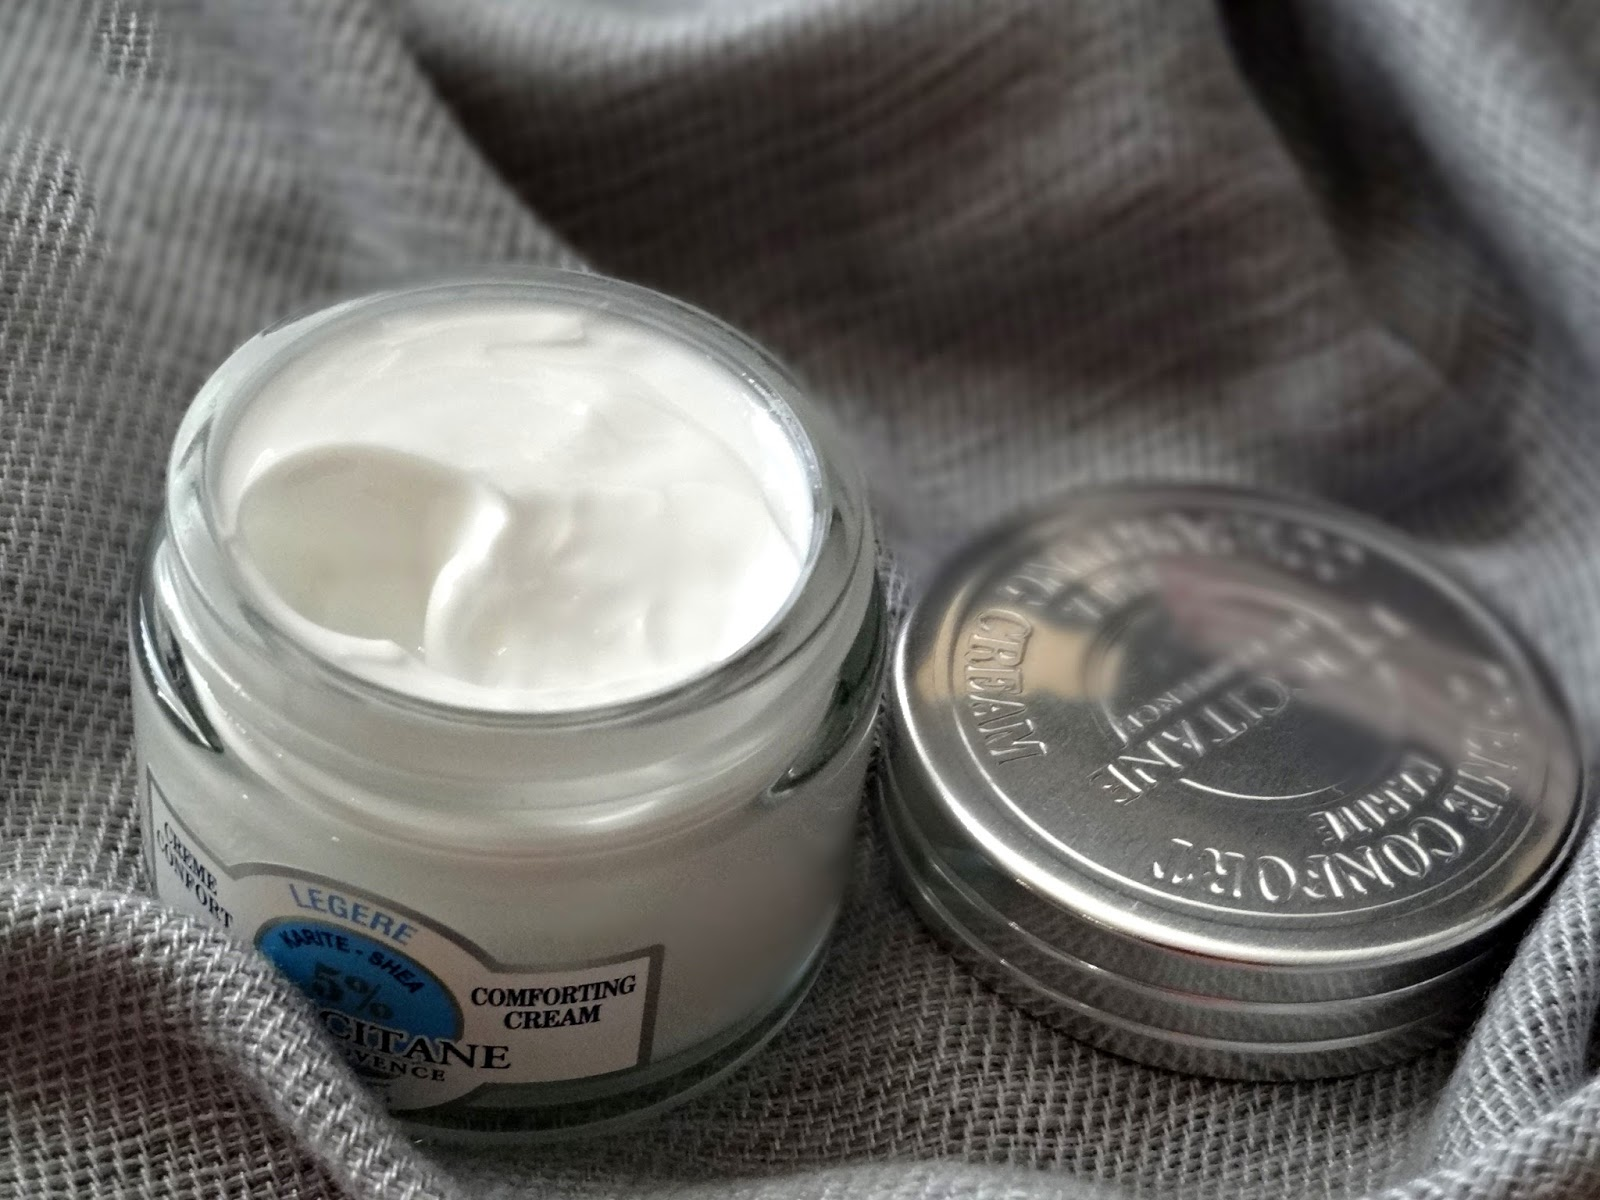 L'Occitane Shea Butter Light Comforting Cream Review, Photos